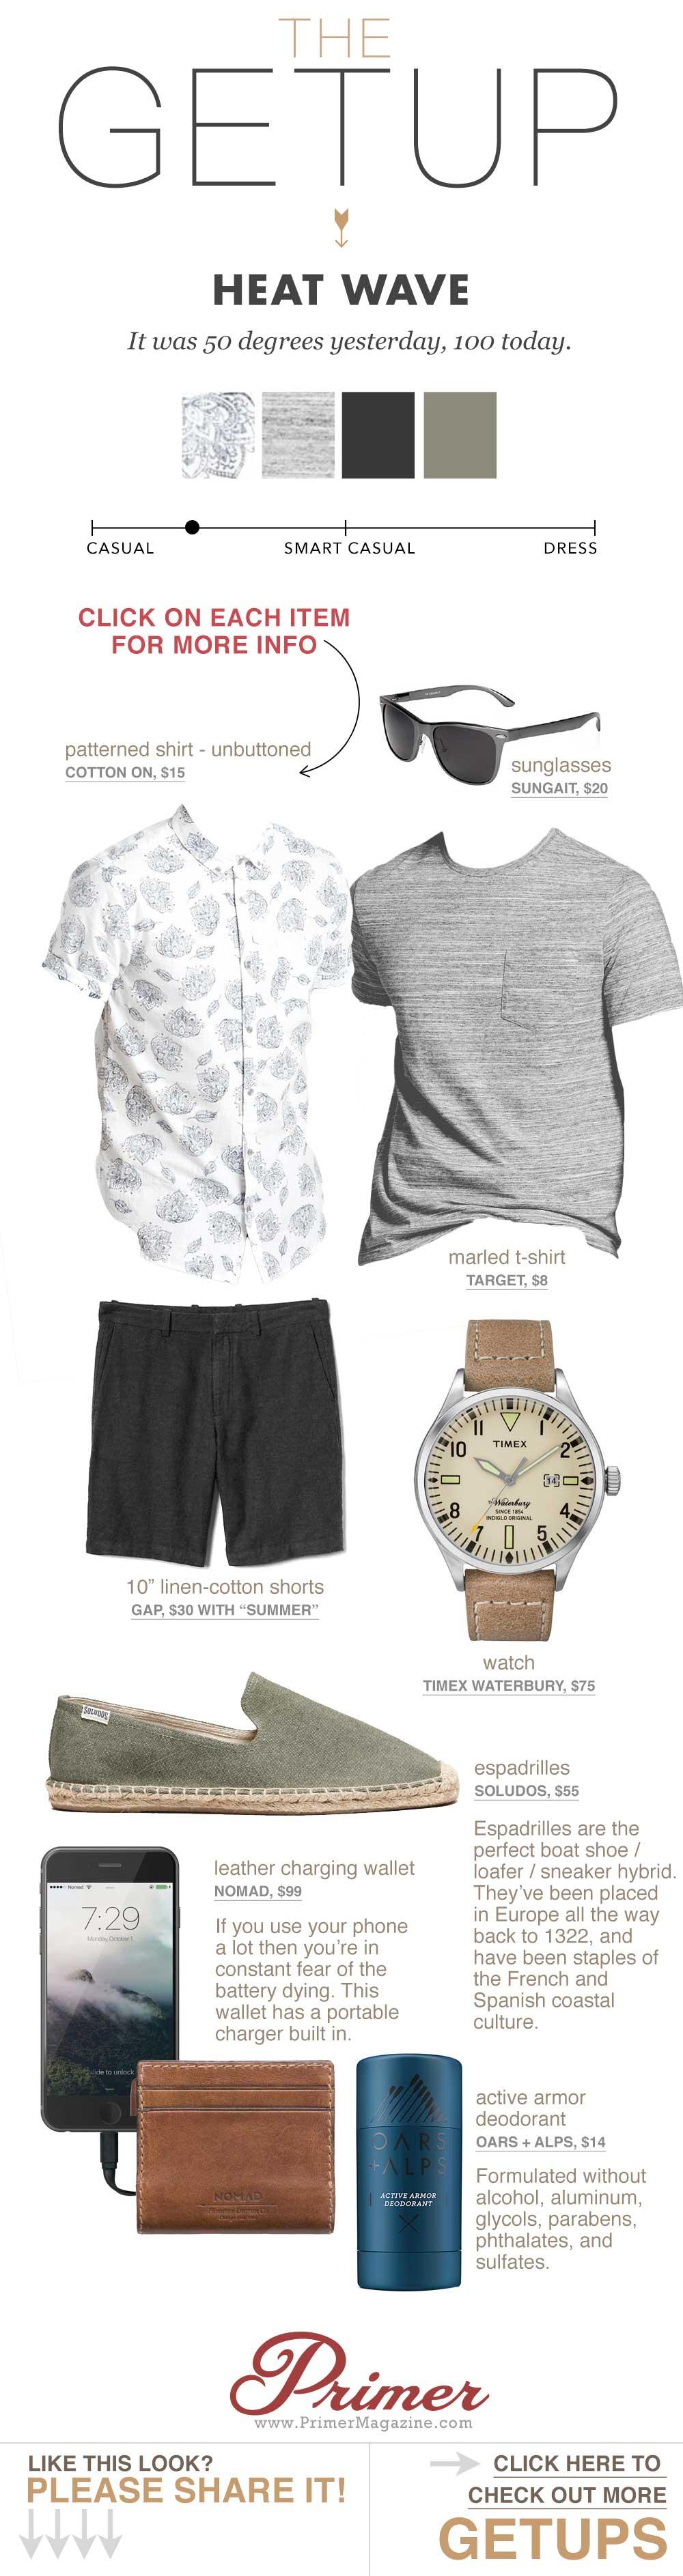 men's summer style - black shorts patterned short sleeve shirt espadrilles